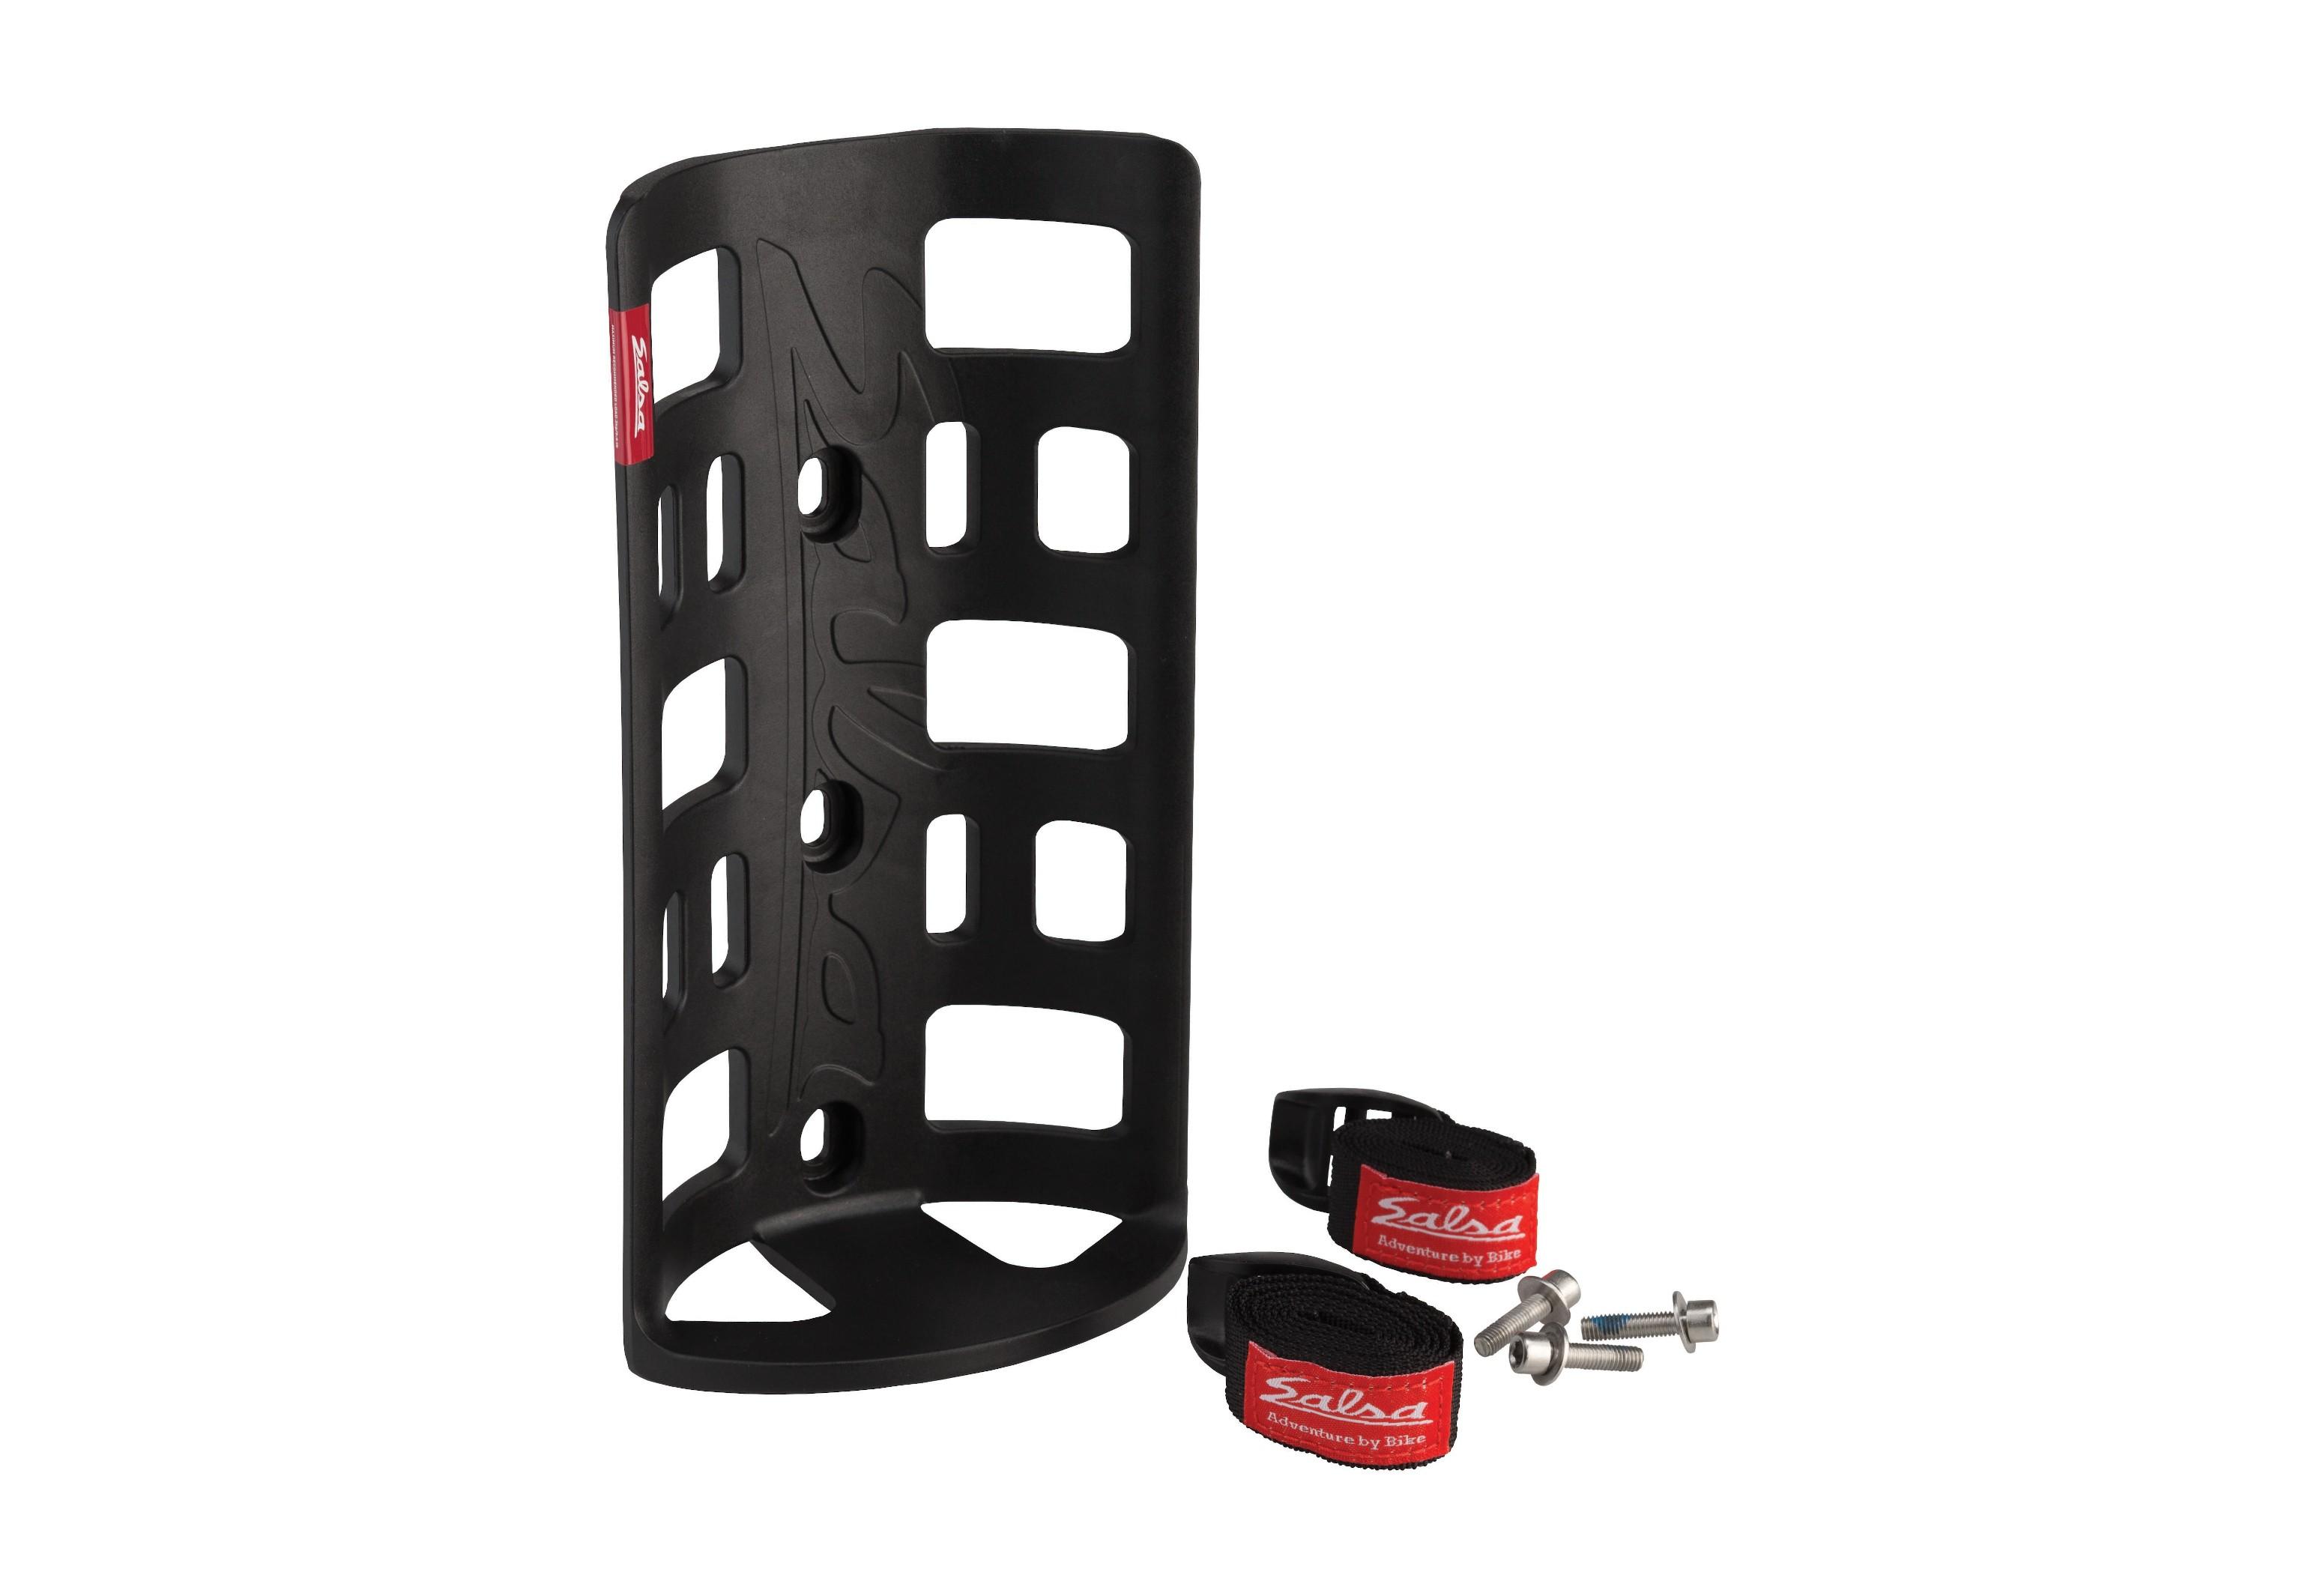 Salsa ANYTHING CAGE HD Rack black nylon avec Straps